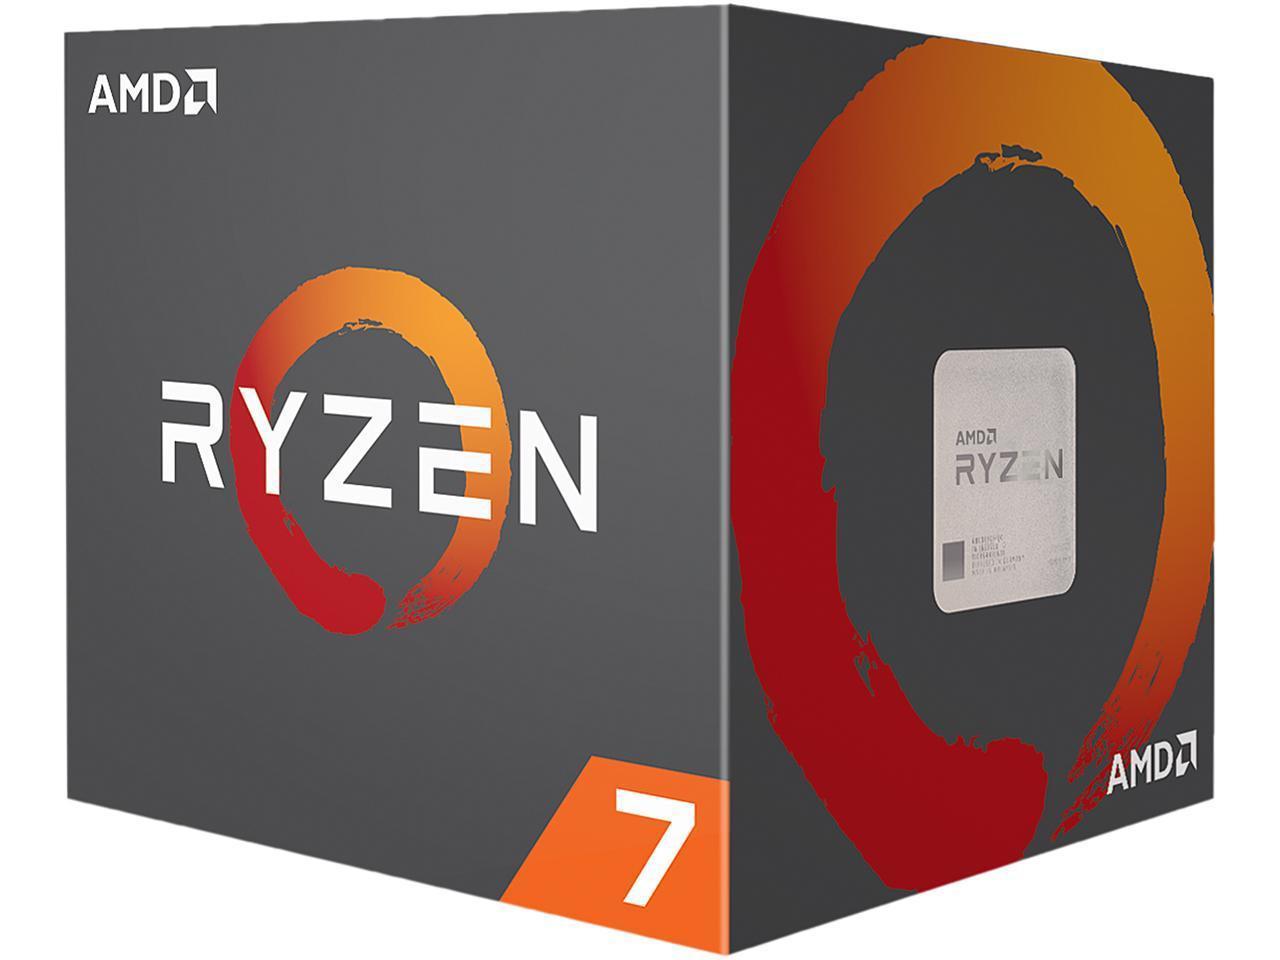 AMD RYZEN 7 2700X 8-Core 3.7 GHz (4.3 GHz Max Boost) Socket AM4 105W YD270XBGAFBOX Desktop Processor - $299.99 + FS @ Newegg